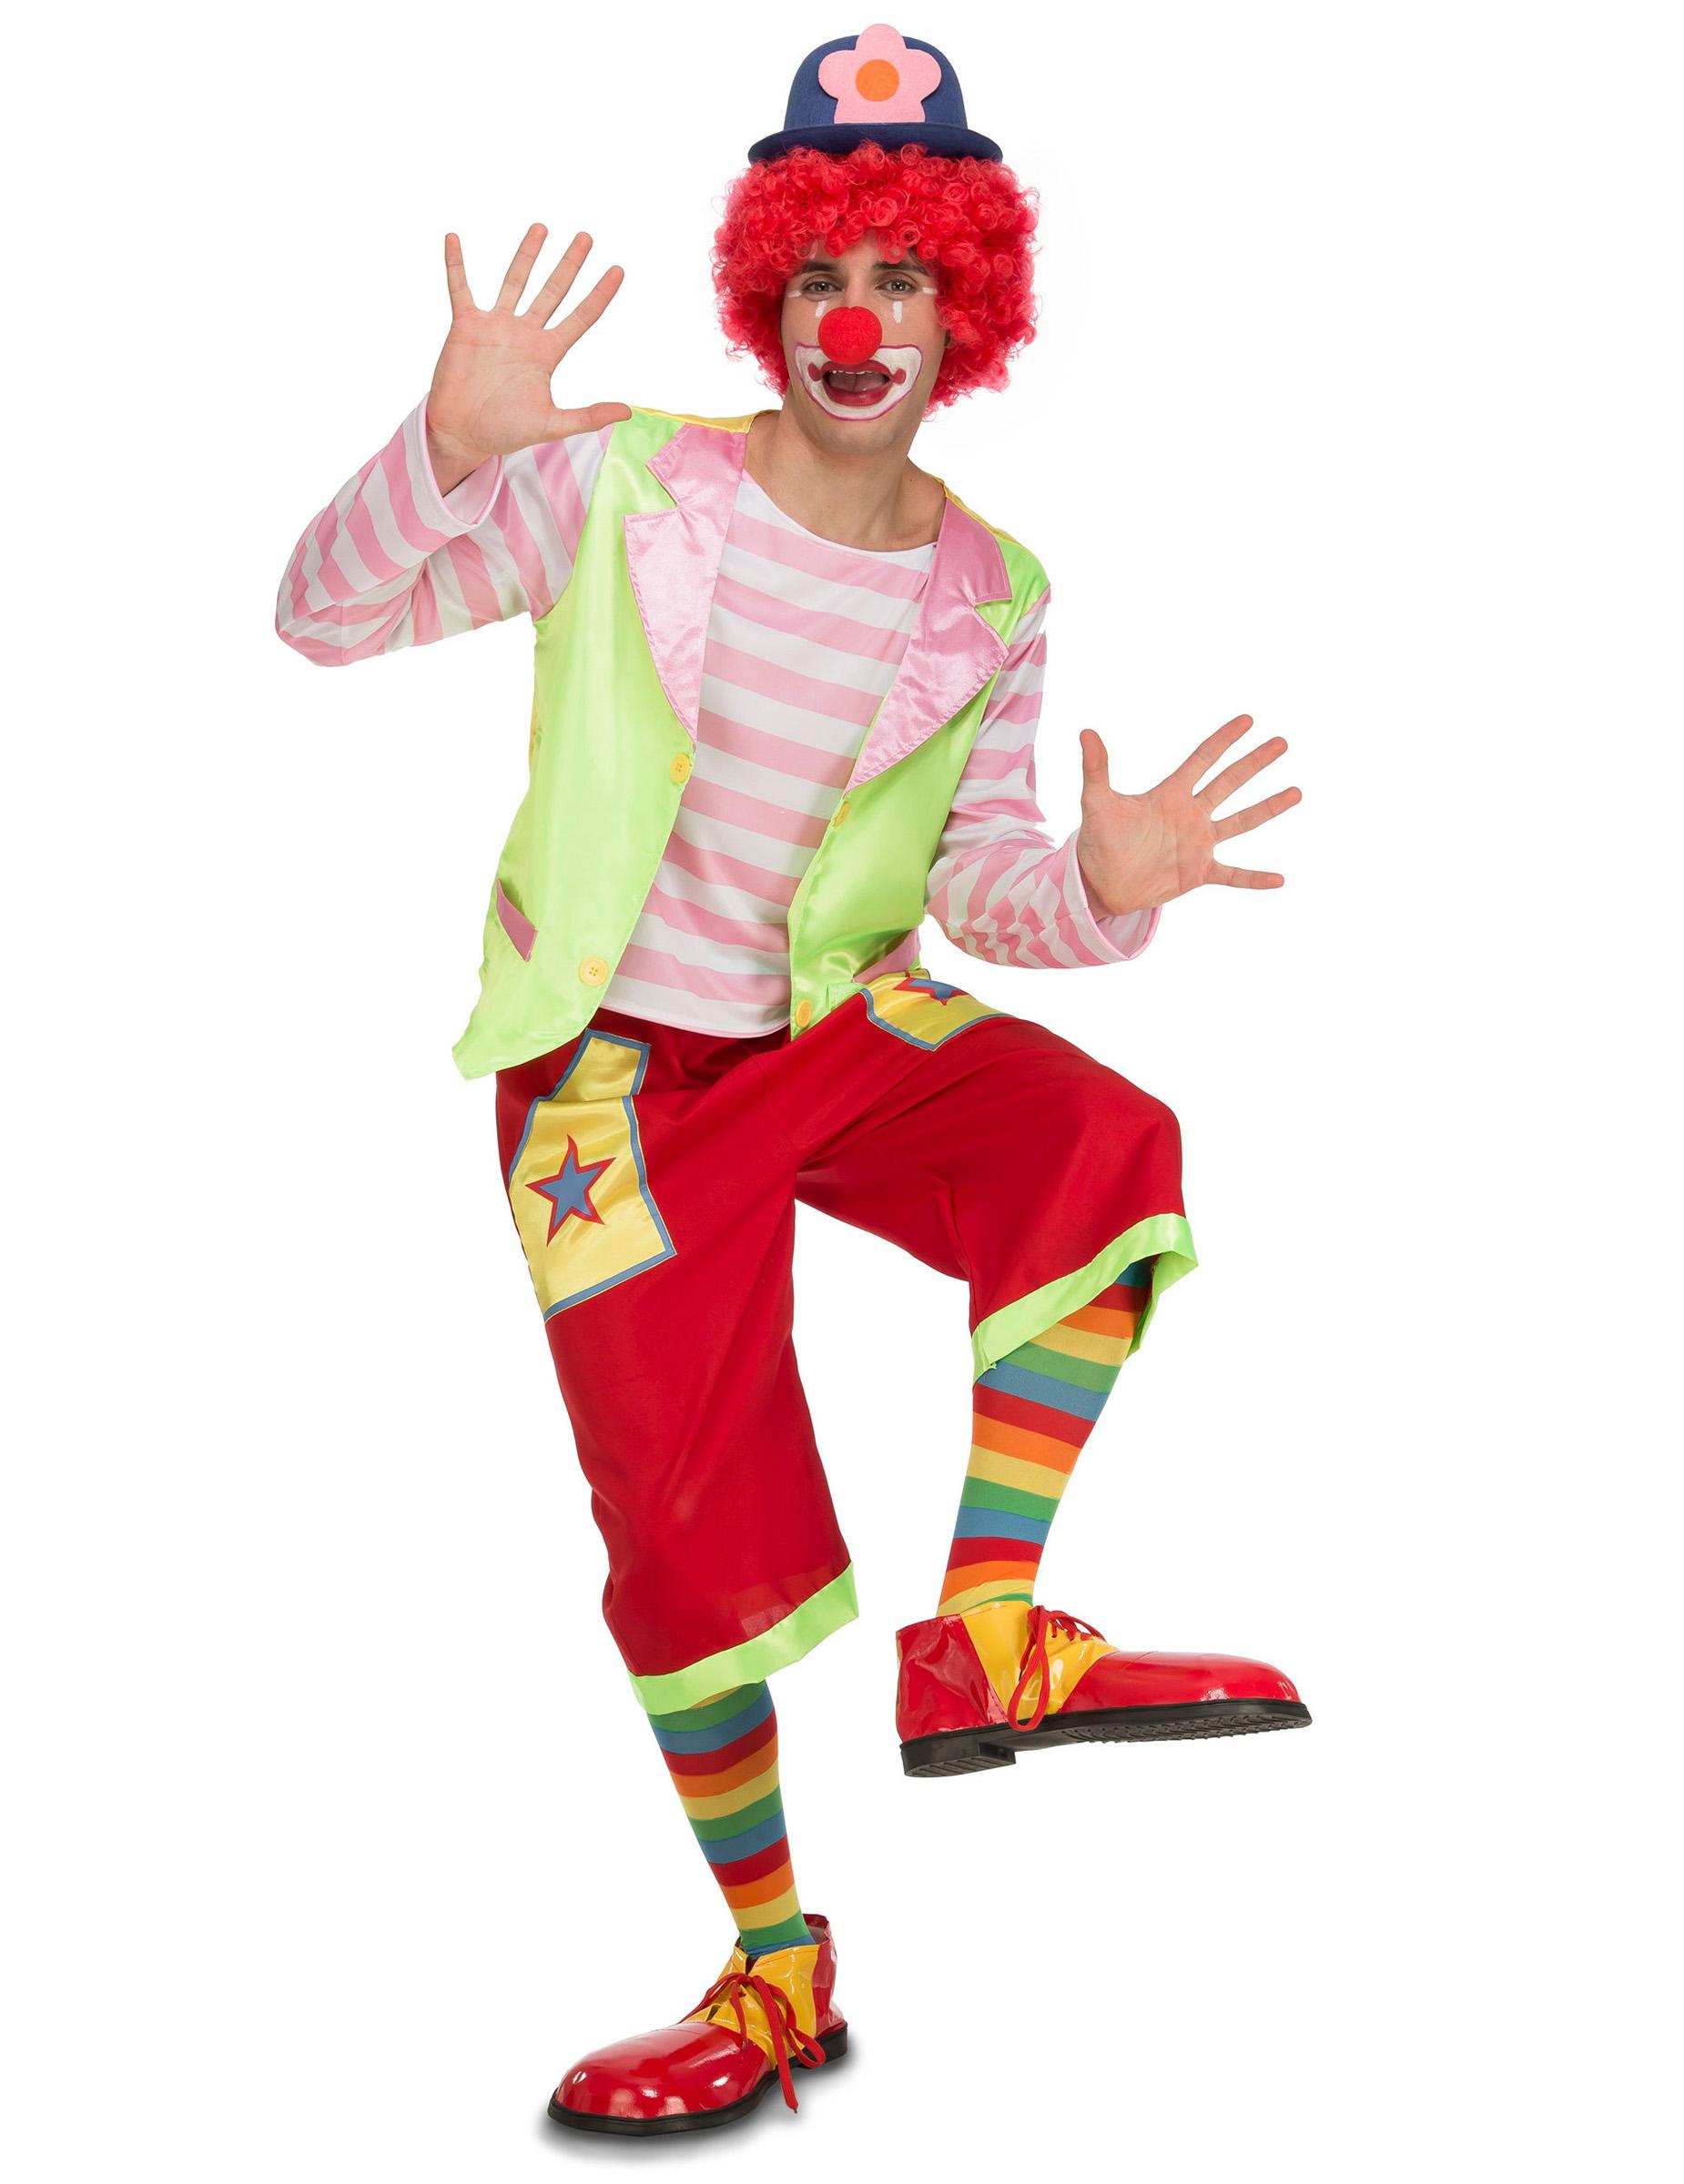 Rodeo Clown Kostum Fur Erwachsene Gunstige Faschings Kostume Bei